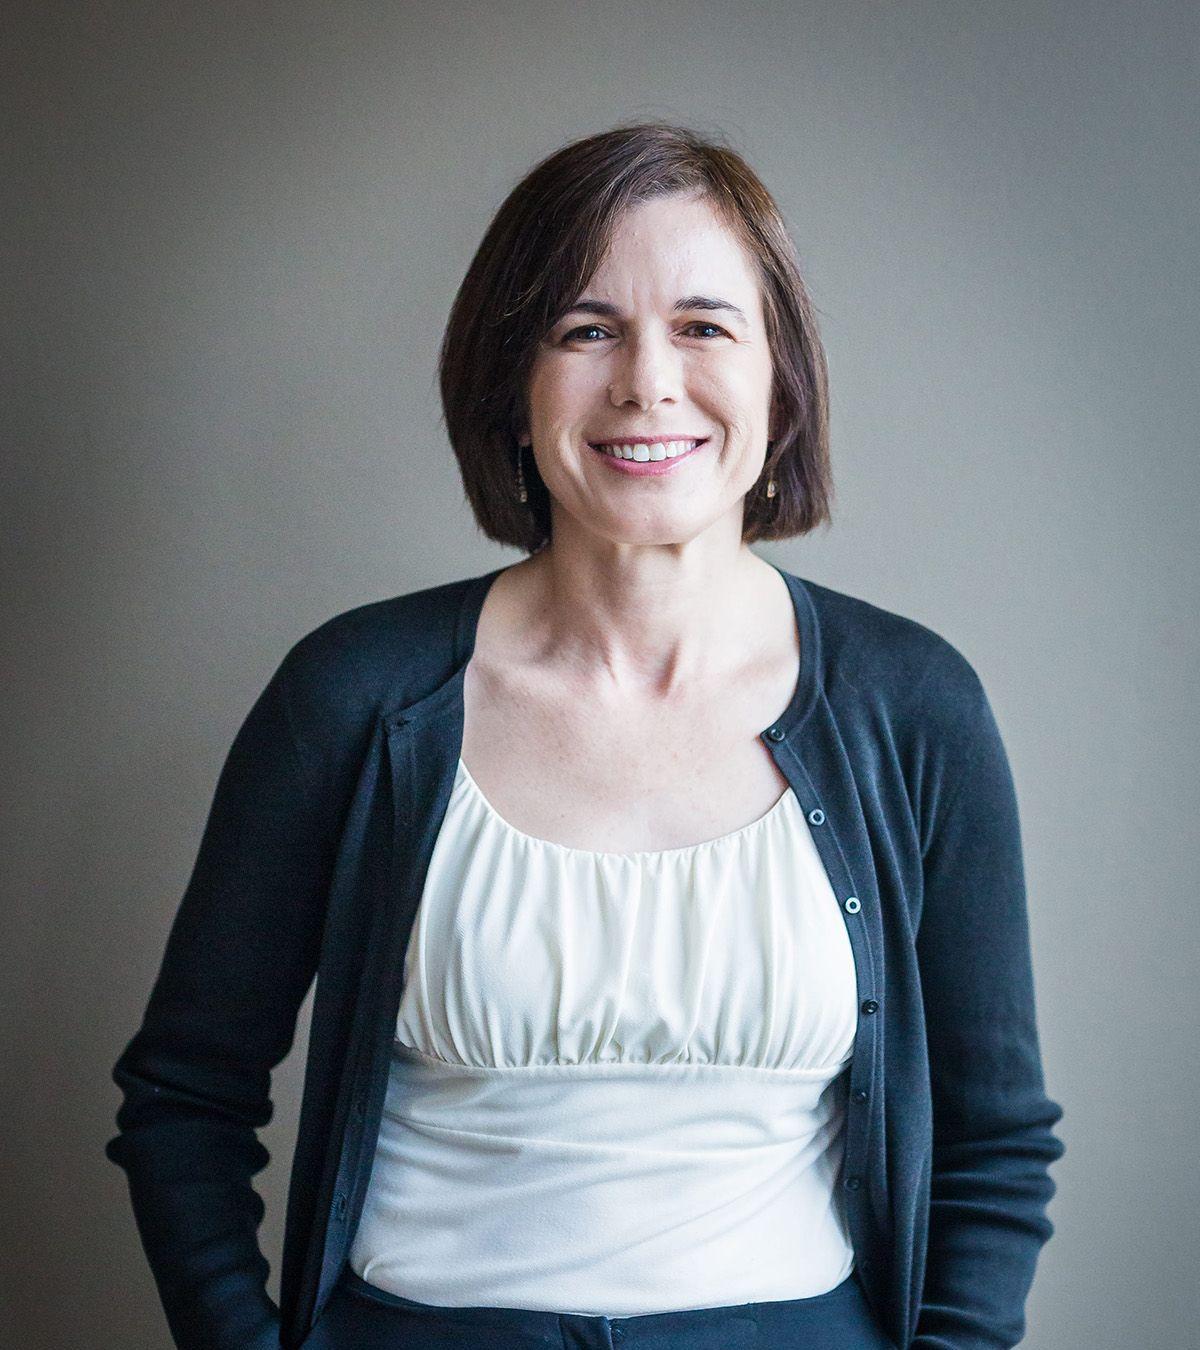 Elizabeth J Hyatt Business Torts And Fraud Trial Lawyer Denver Colorado.